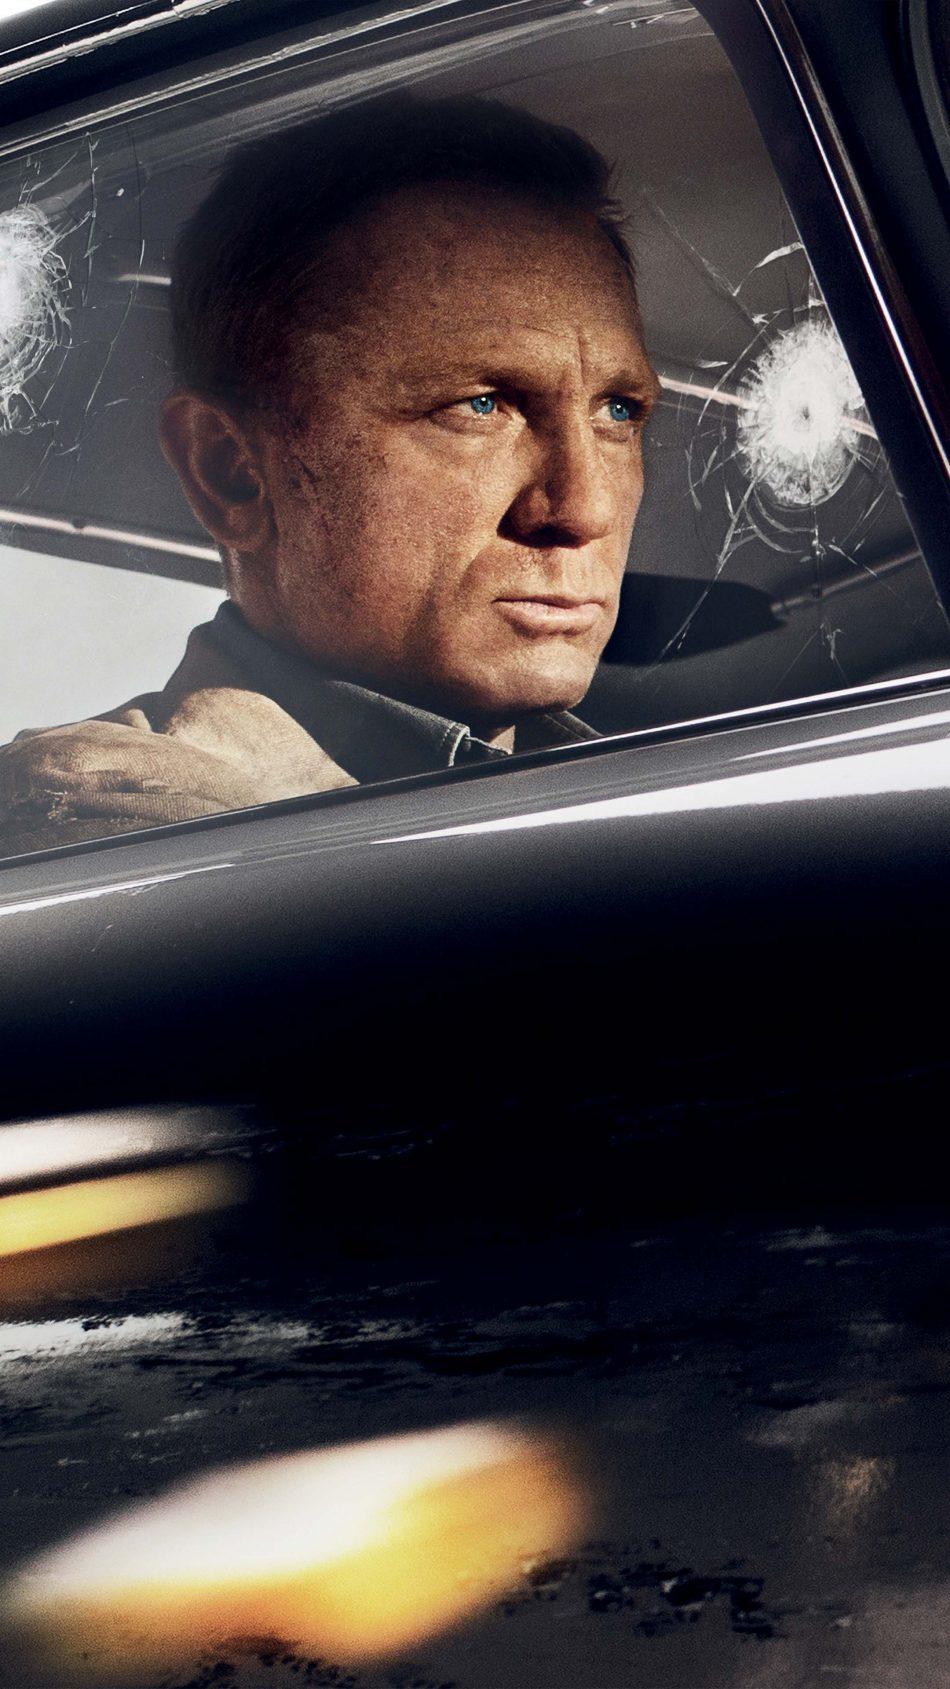 Daniel Craig In No Time To Die 2020 4K Ultra HD Mobile Wallpaper